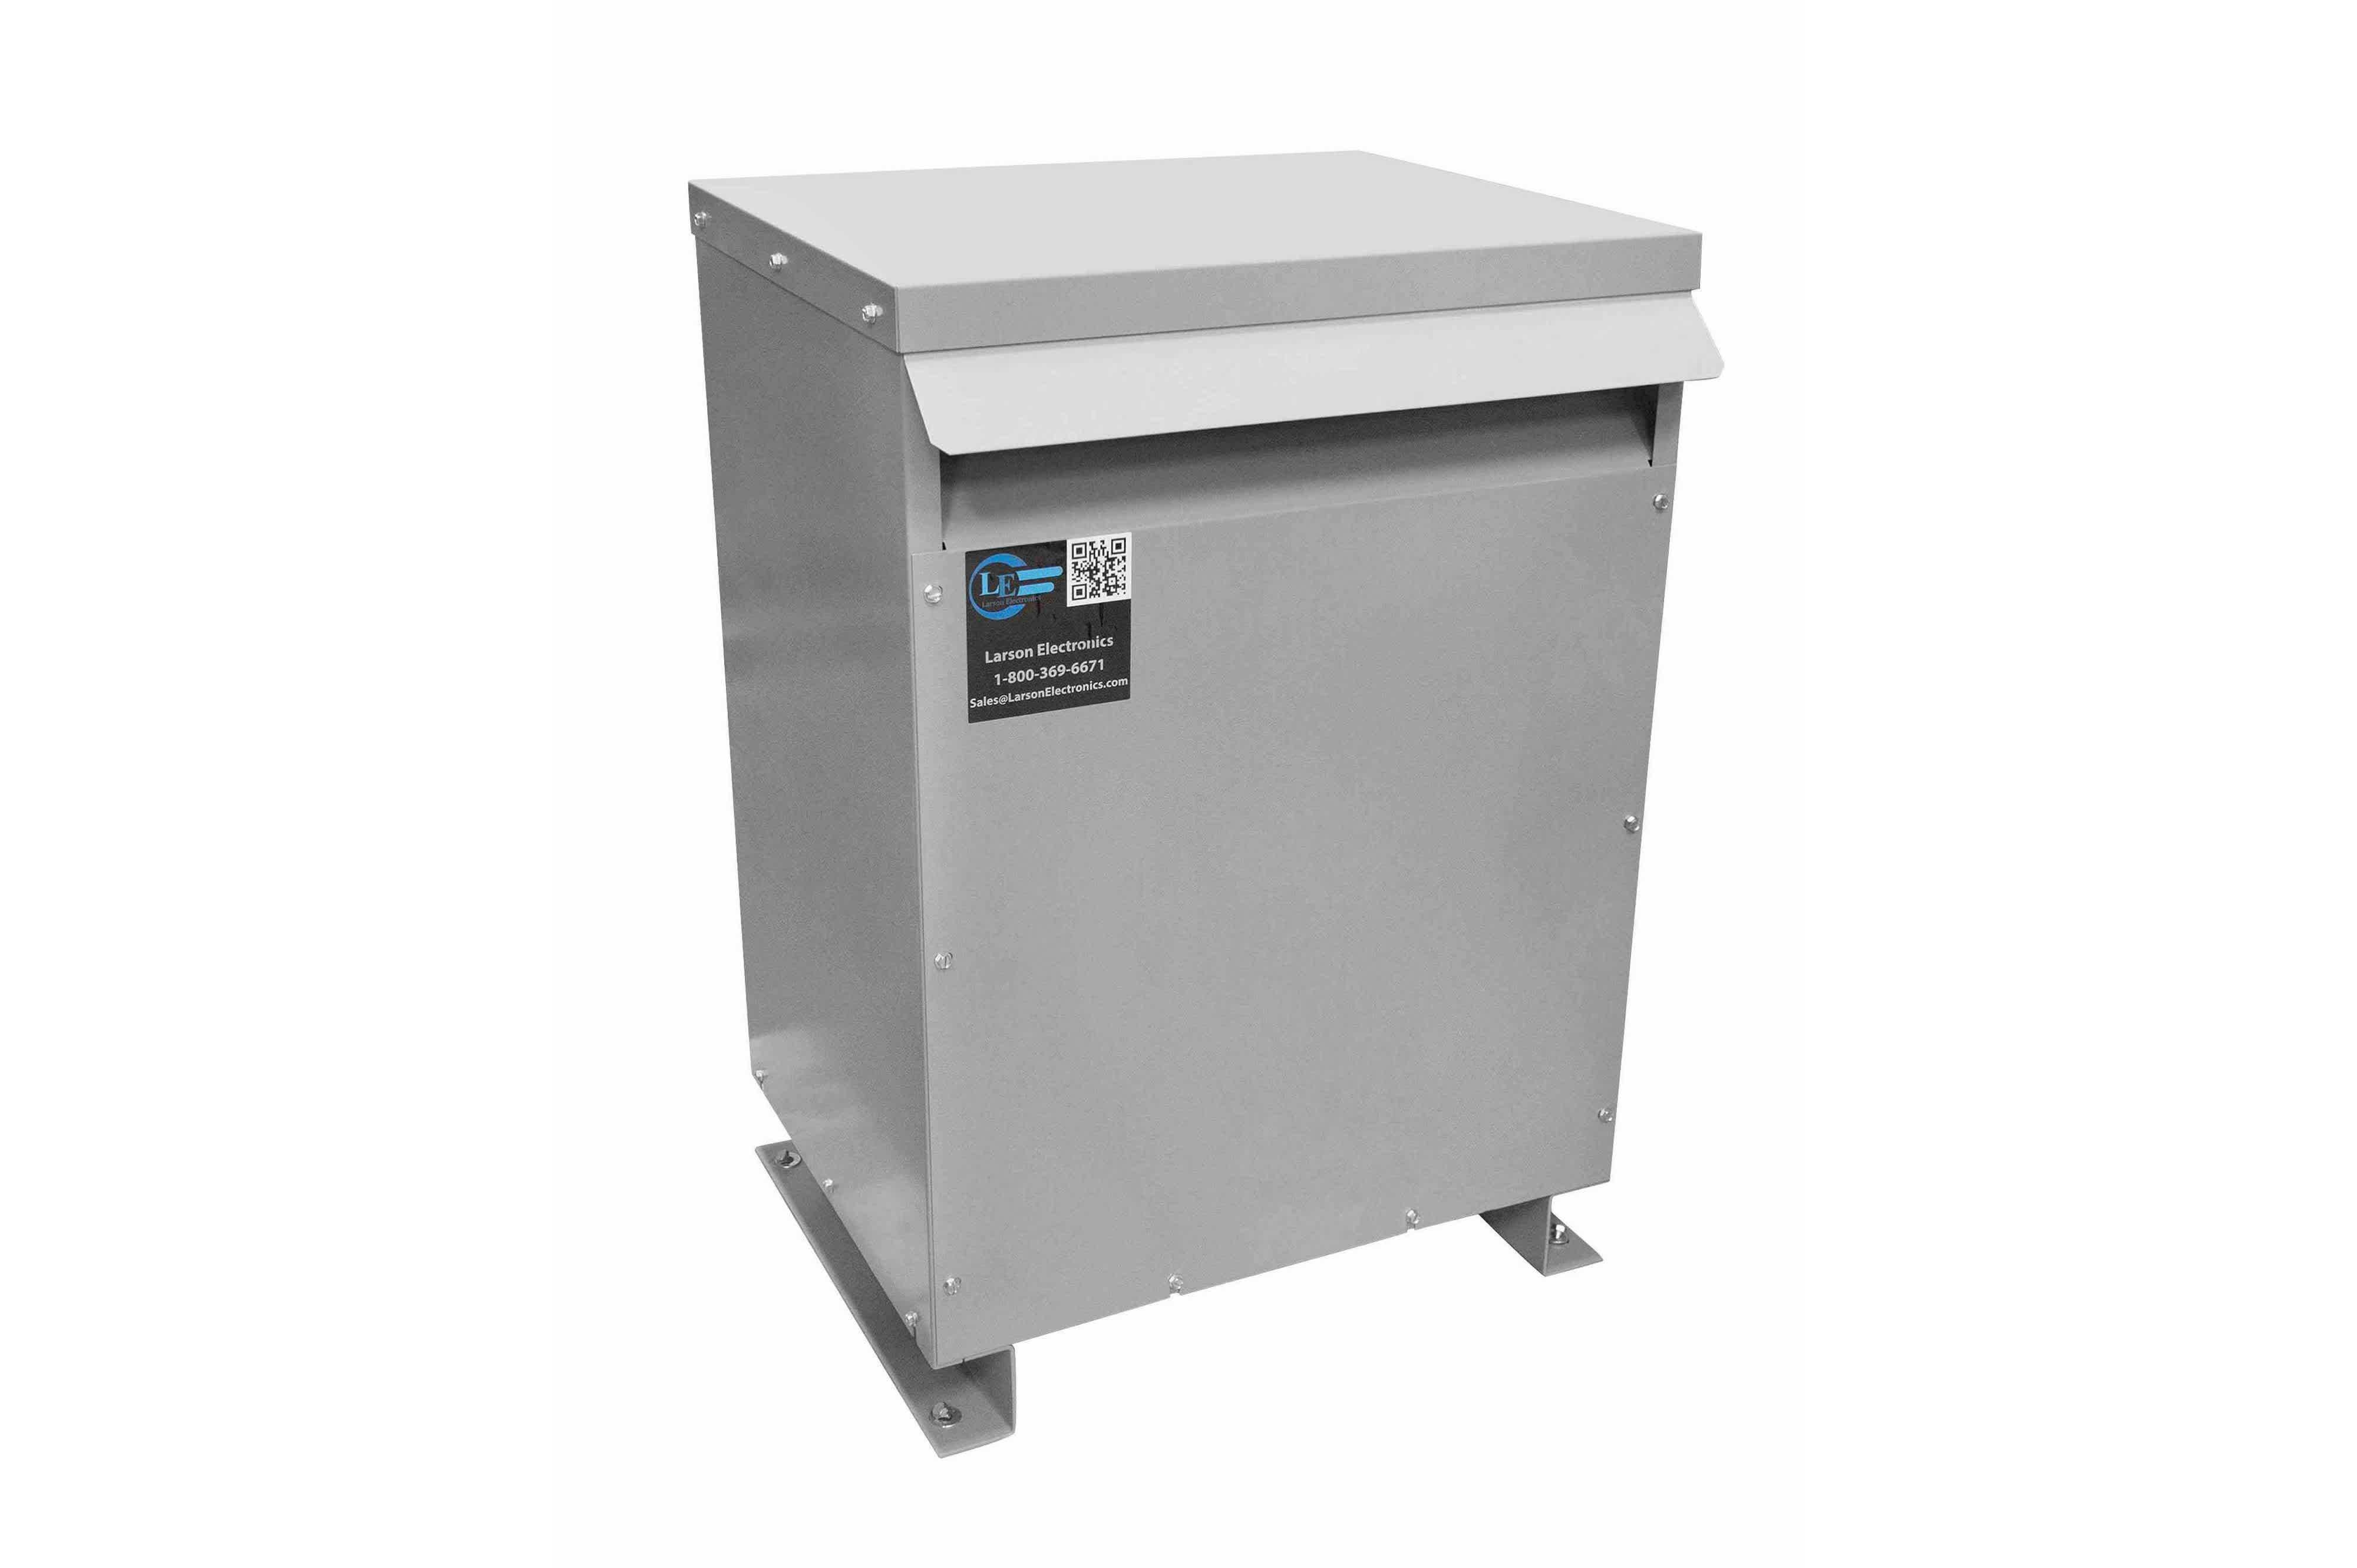 12 kVA 3PH DOE Transformer, 600V Delta Primary, 208Y/120 Wye-N Secondary, N3R, Ventilated, 60 Hz